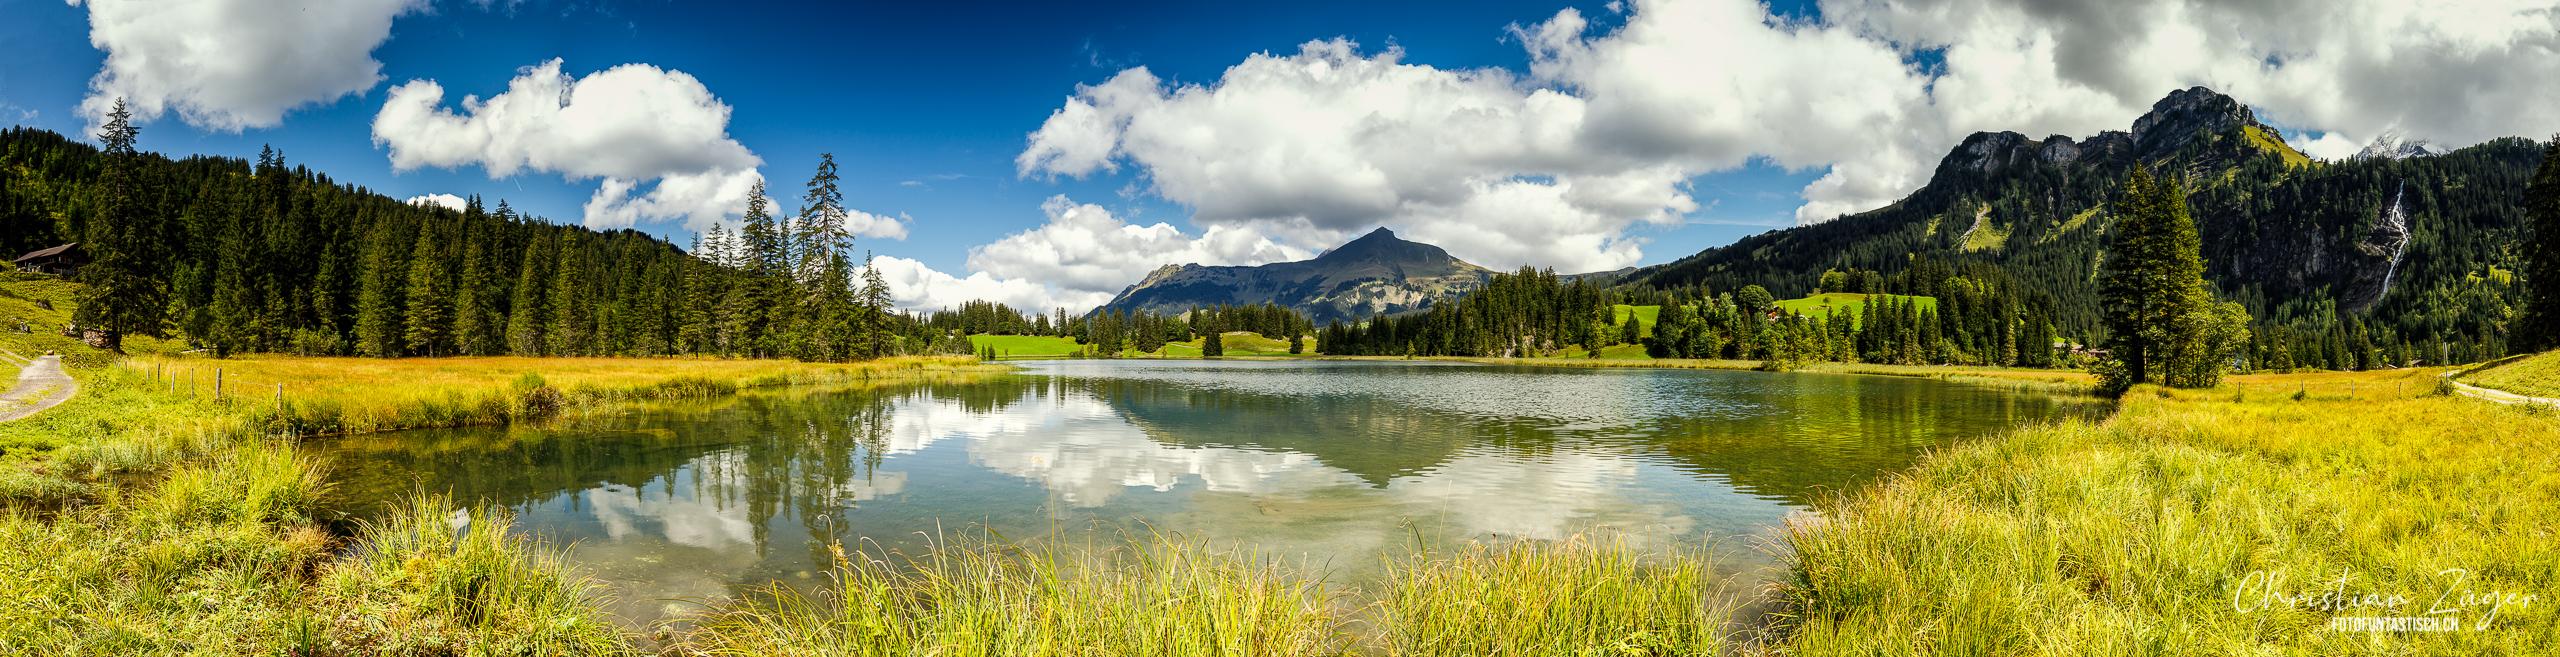 Berge, Bergsee, Format, Fototechnik, Landschaft, Lauenensee, Panorama, Umwelt, Vermerk